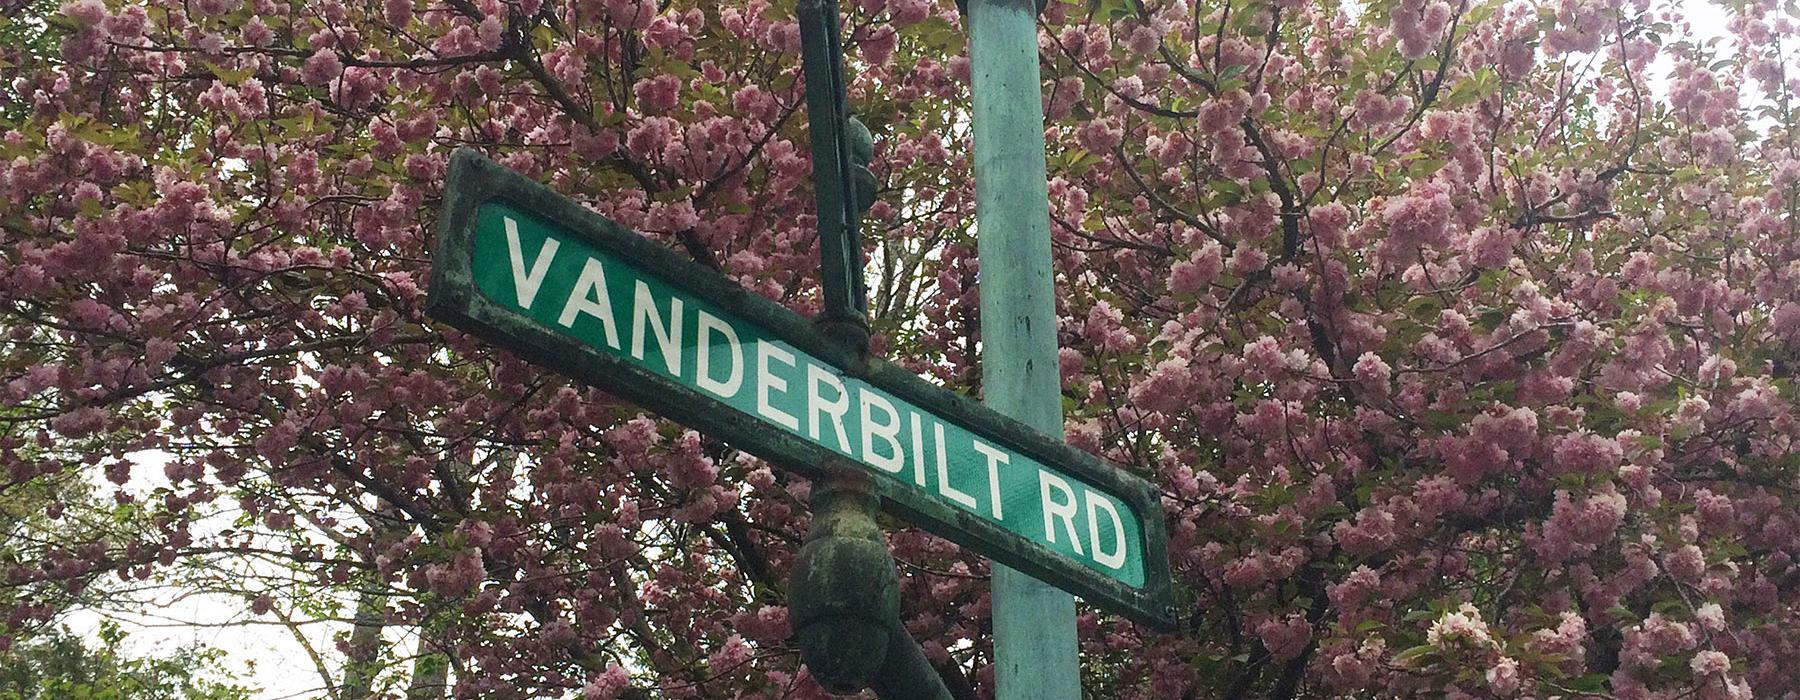 Vanderbilt Lamp post